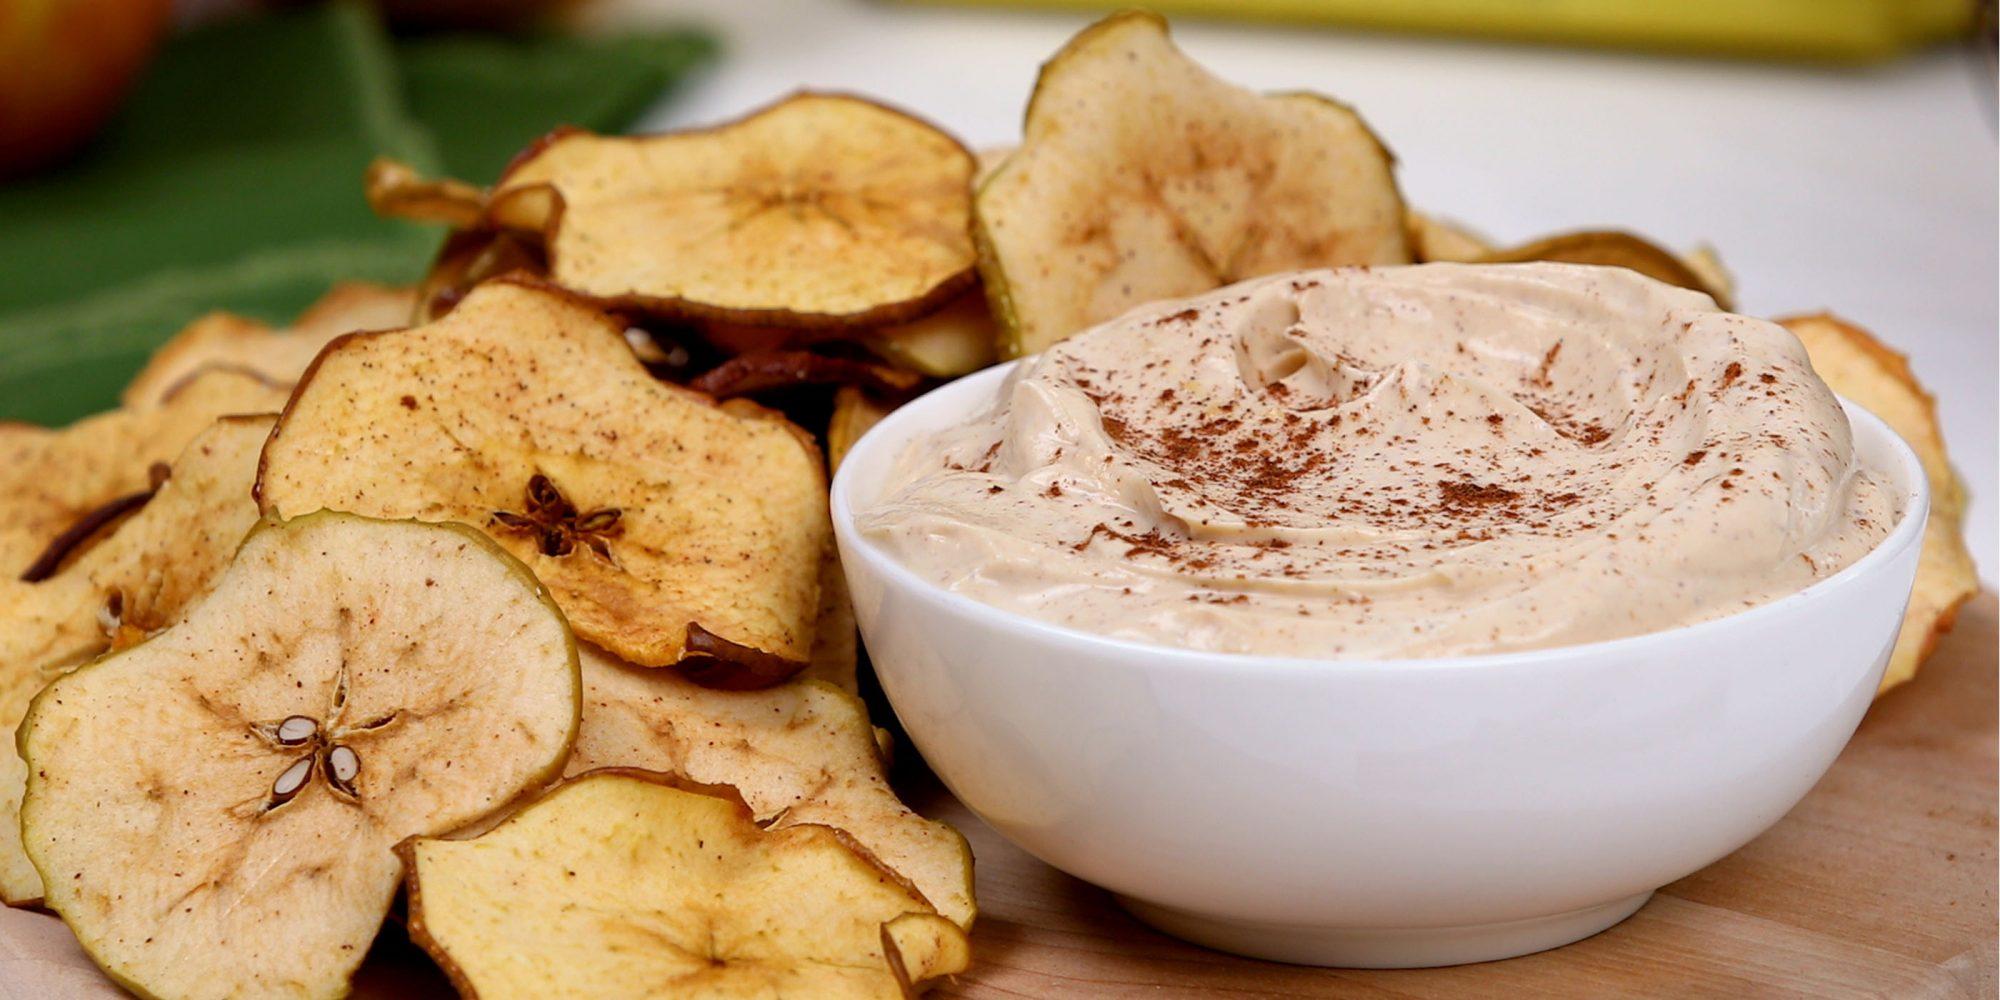 Cinnamon Apple Chips with Peanut Butter Yogurt Dip